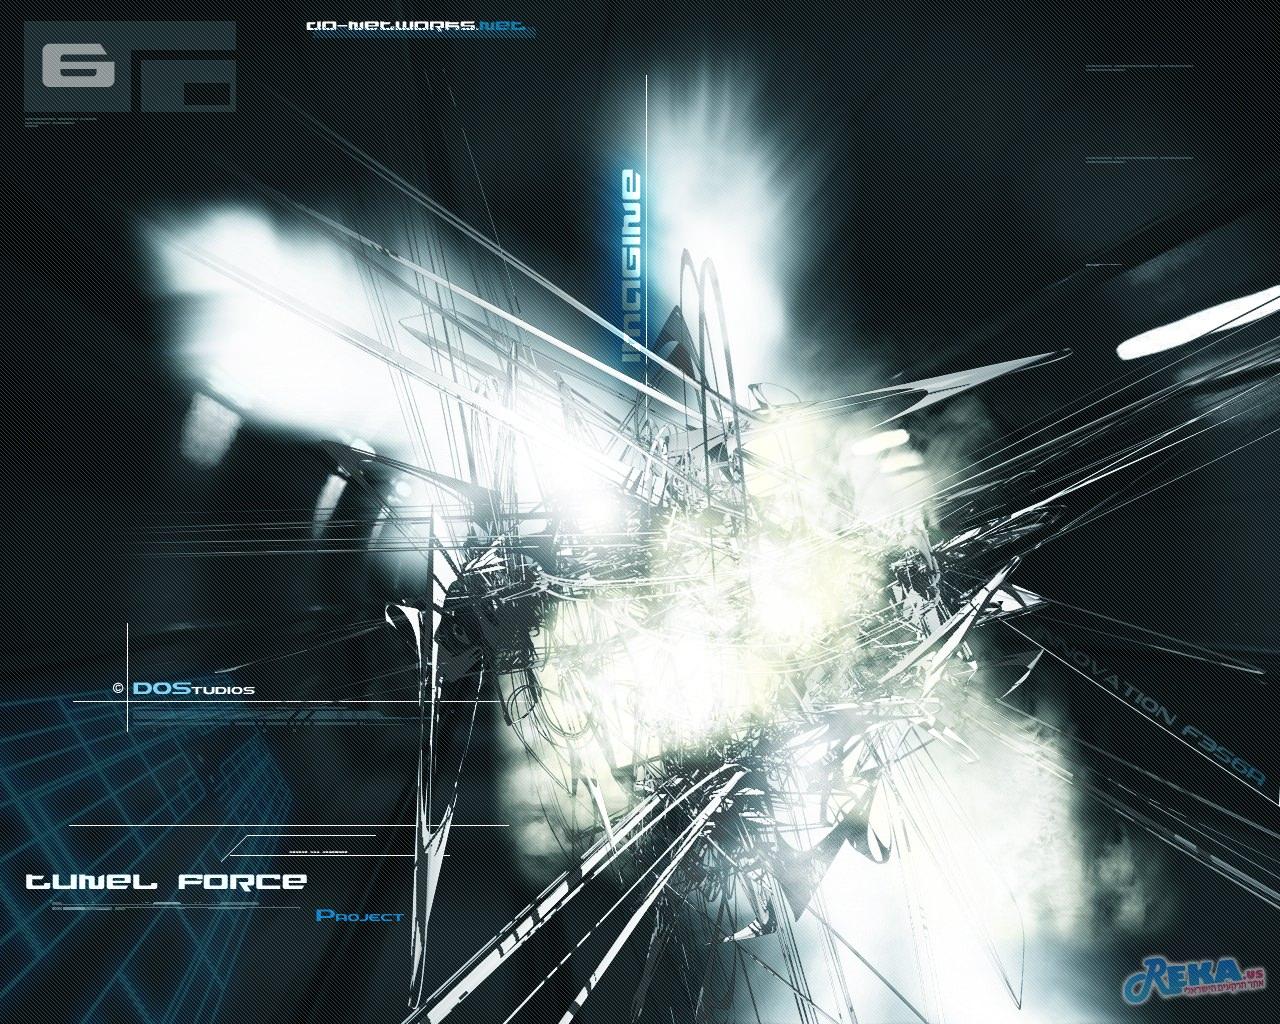 Tunel_Force-1280x1024.jpg